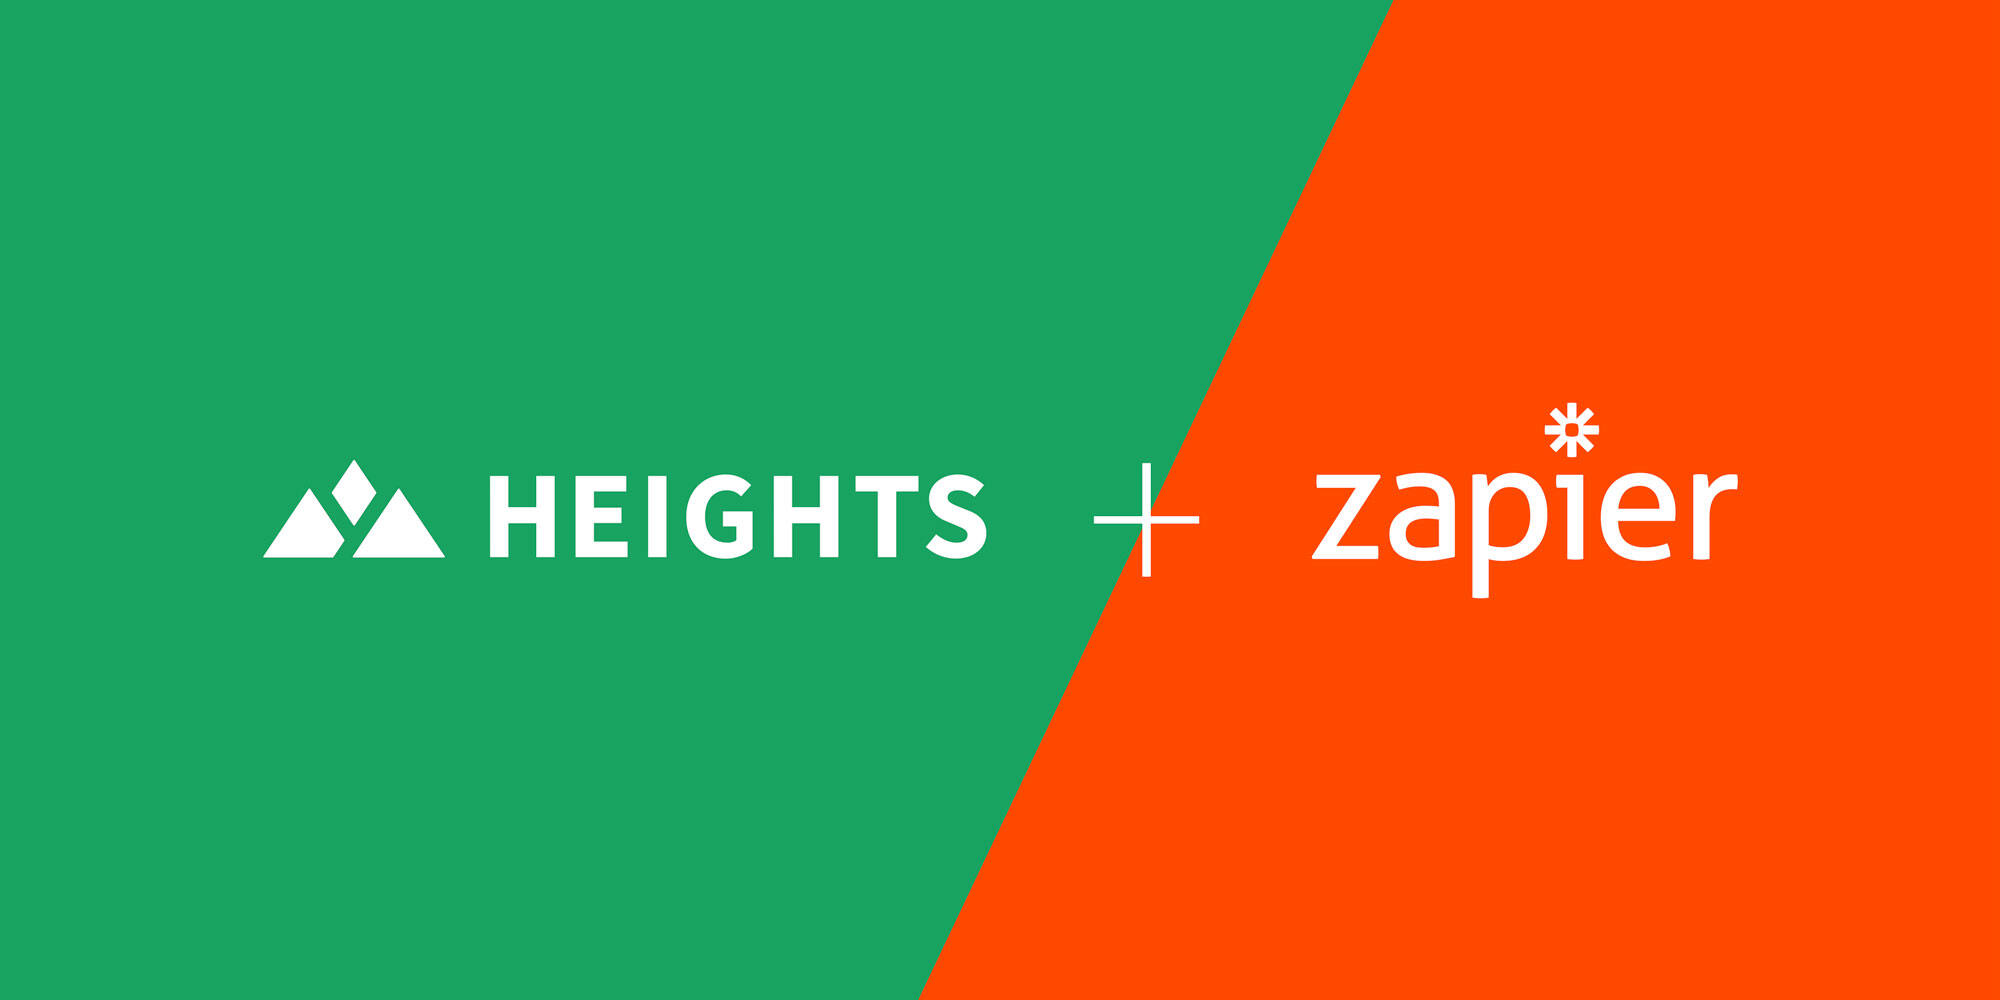 Heights Platform Using Zapier in Your Online Course Business